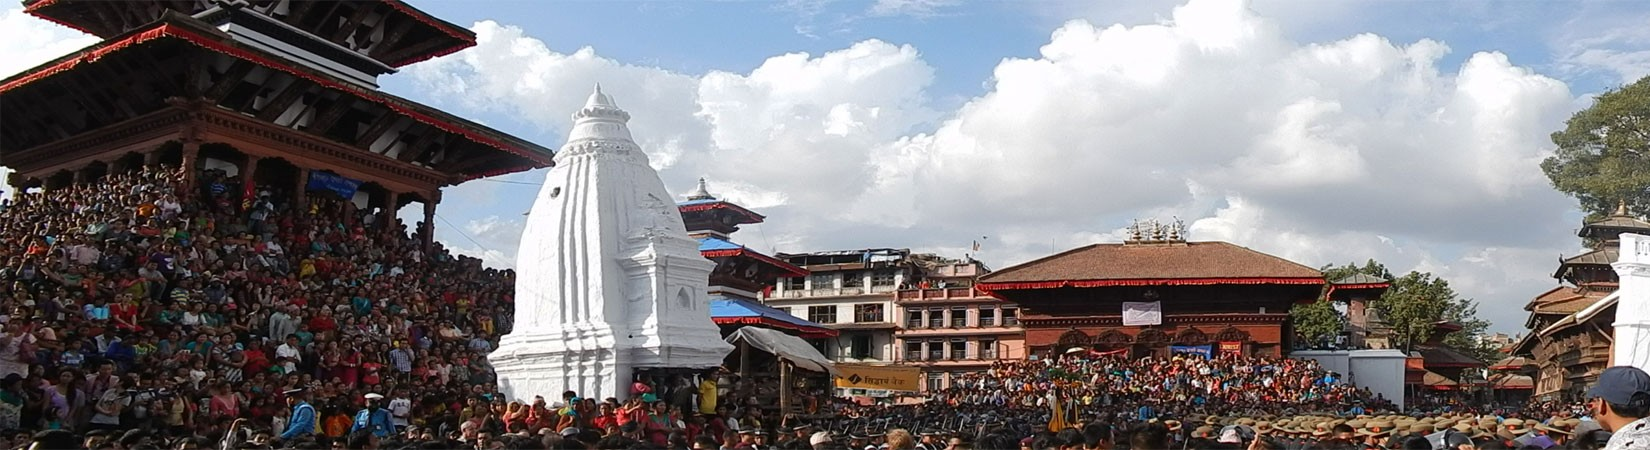 A Glimpse of Indra Jatra Festival in Kathmandu Durbar Square.